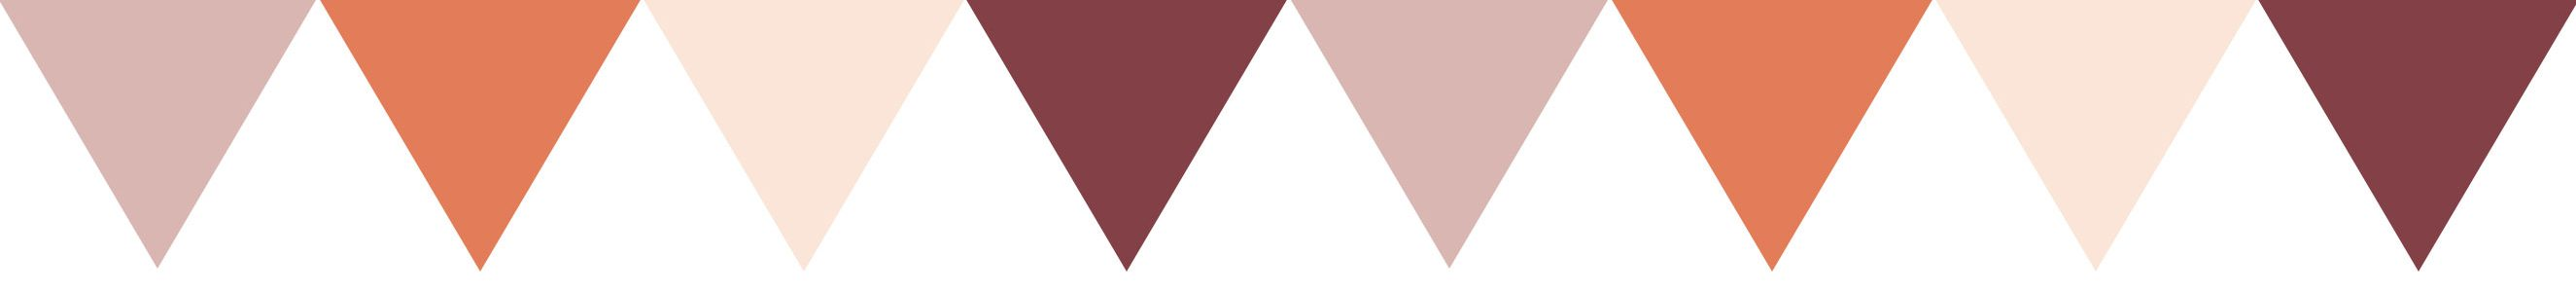 http://lookbook.allee-du-foulard.fr/wp-content/uploads/2018/06/0679-ADF-Accessoires-de-mode-LB-Coll_geometrique-test-triangle-2650x300.jpg